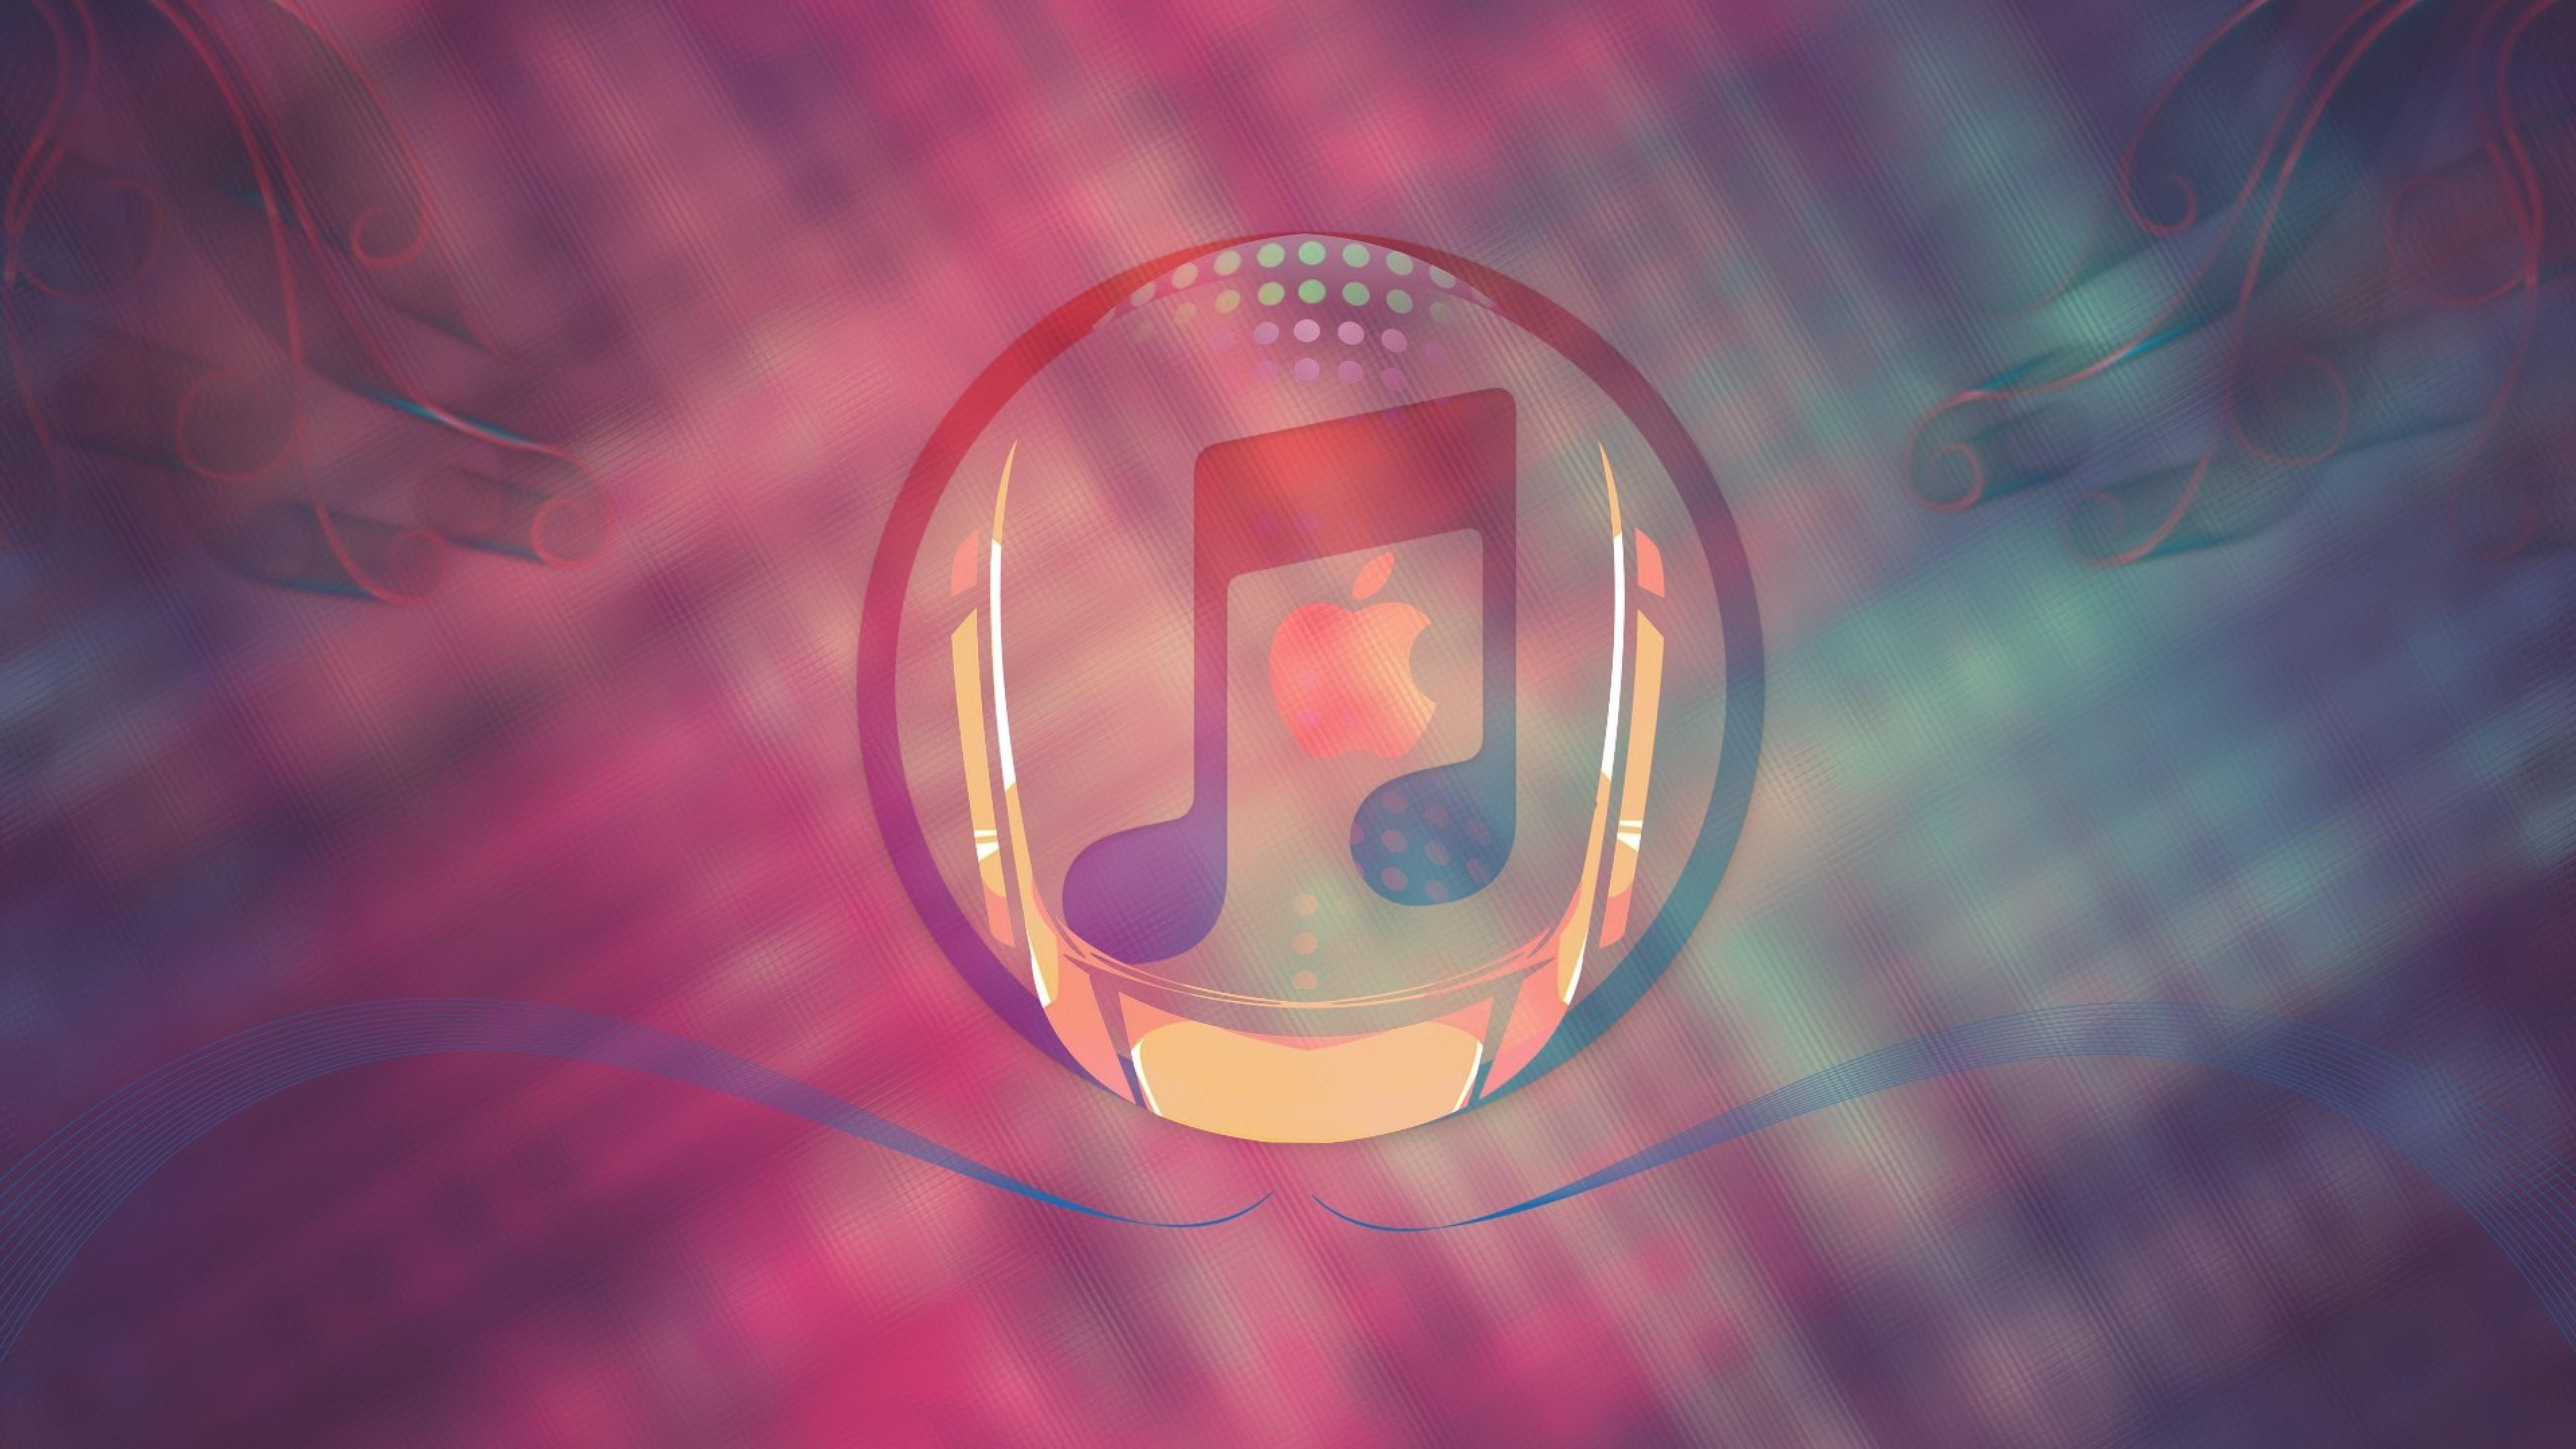 apple itunes art hd computer 4k wallpapers images